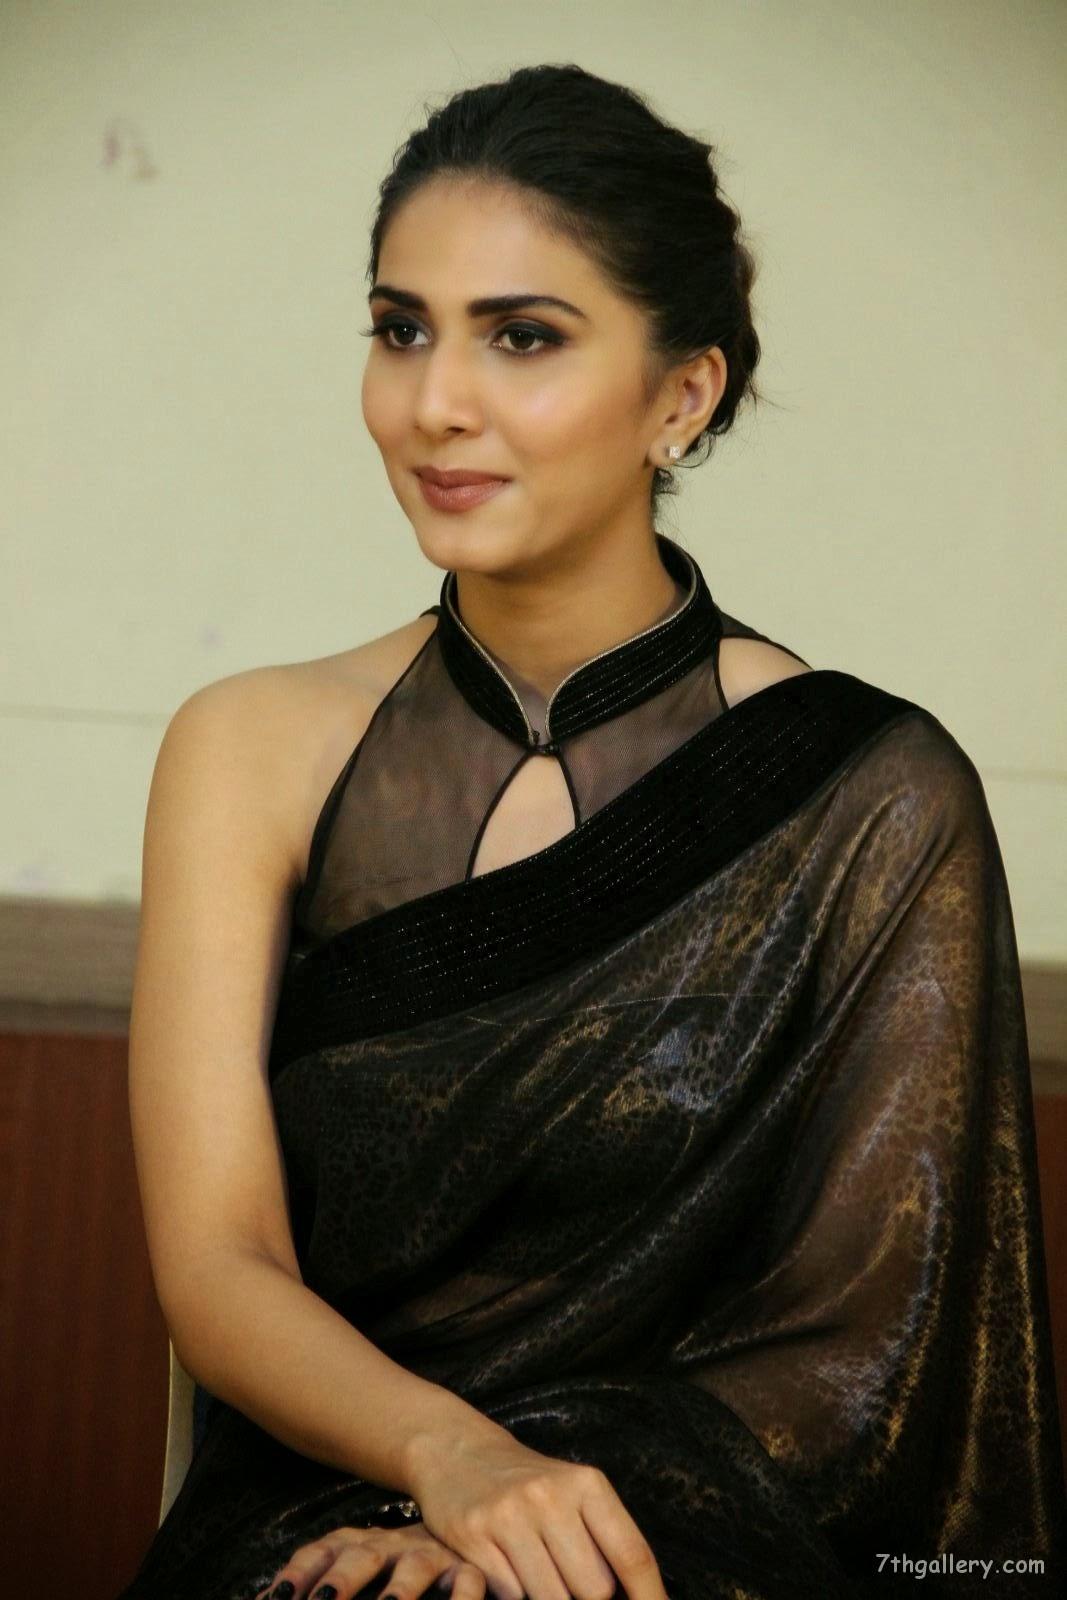 Hindi Movie Actress Vani Kapoor In Black Saree HD Images Wallpaper Pics